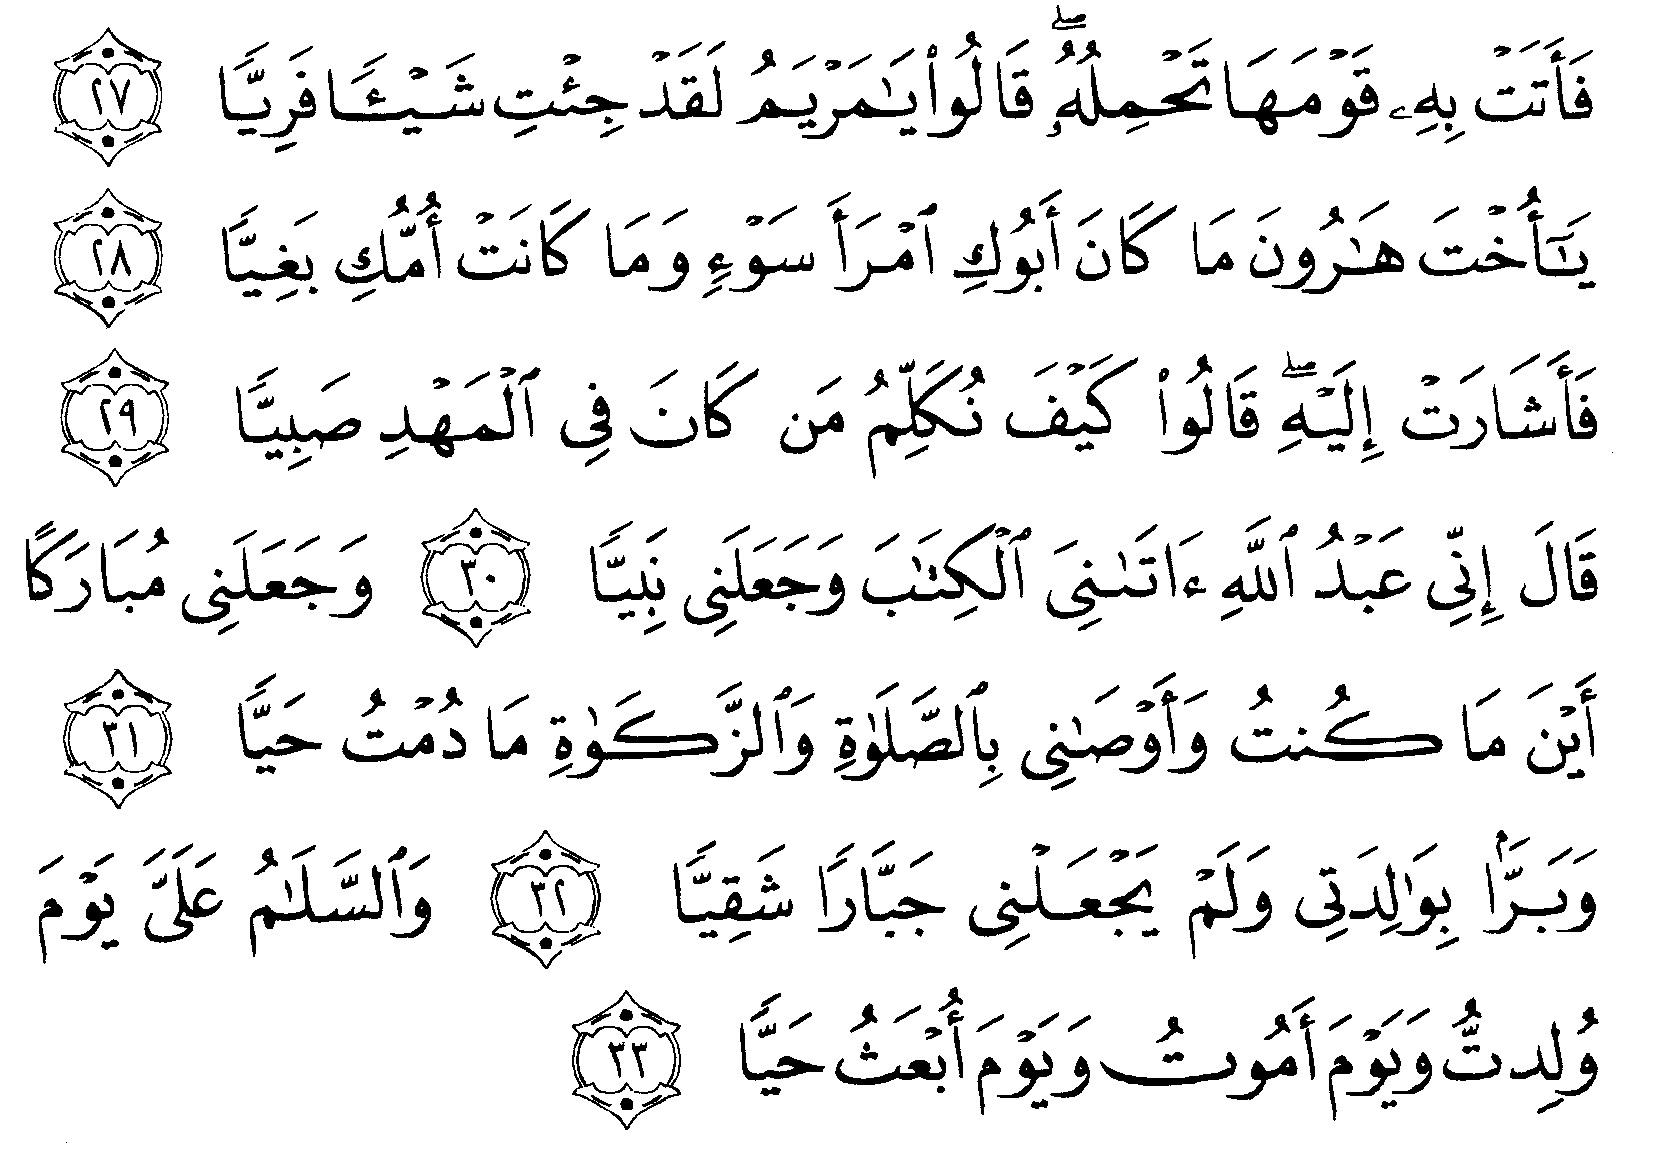 Tafsir Ibnu Katsir Surah Maryam Ayat 27 33 Alquranmulia